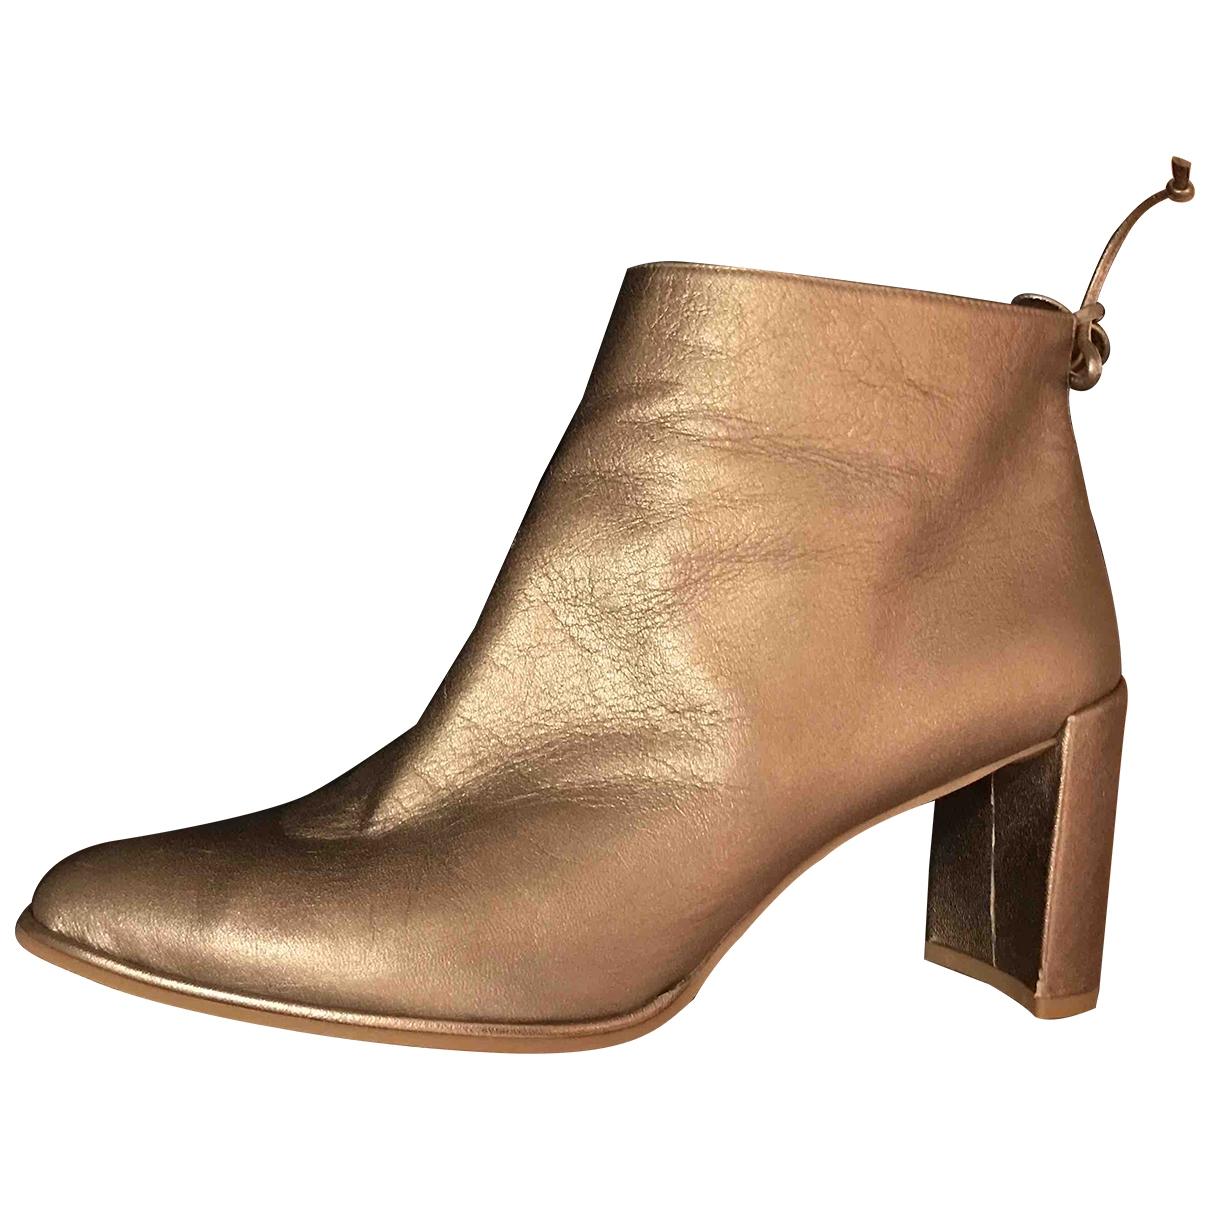 Stuart Weitzman \N Metallic Leather Ankle boots for Women 41 EU